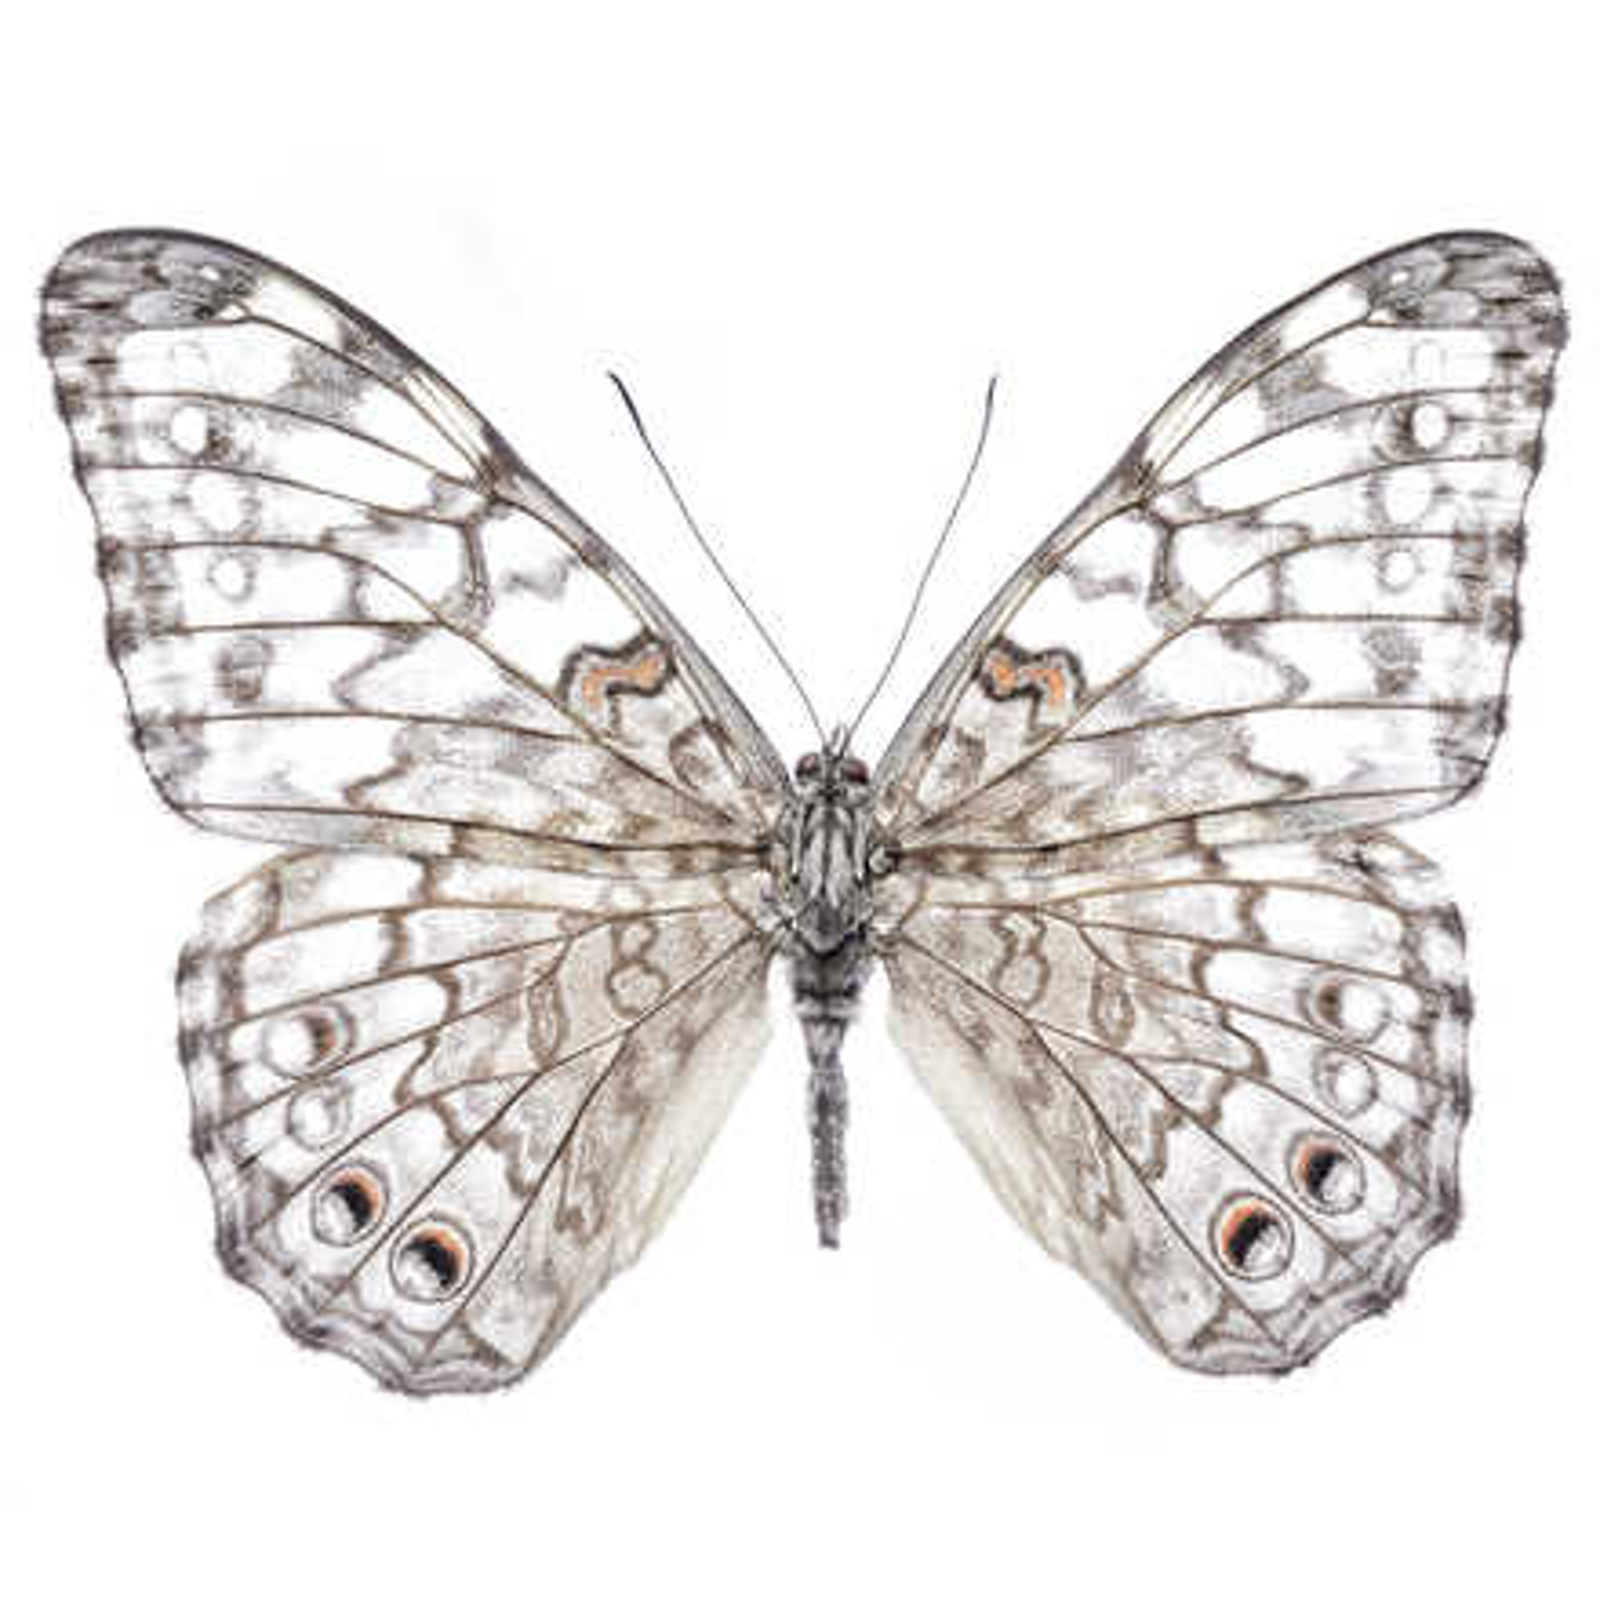 Butterfly VI - Heiko Hellwig